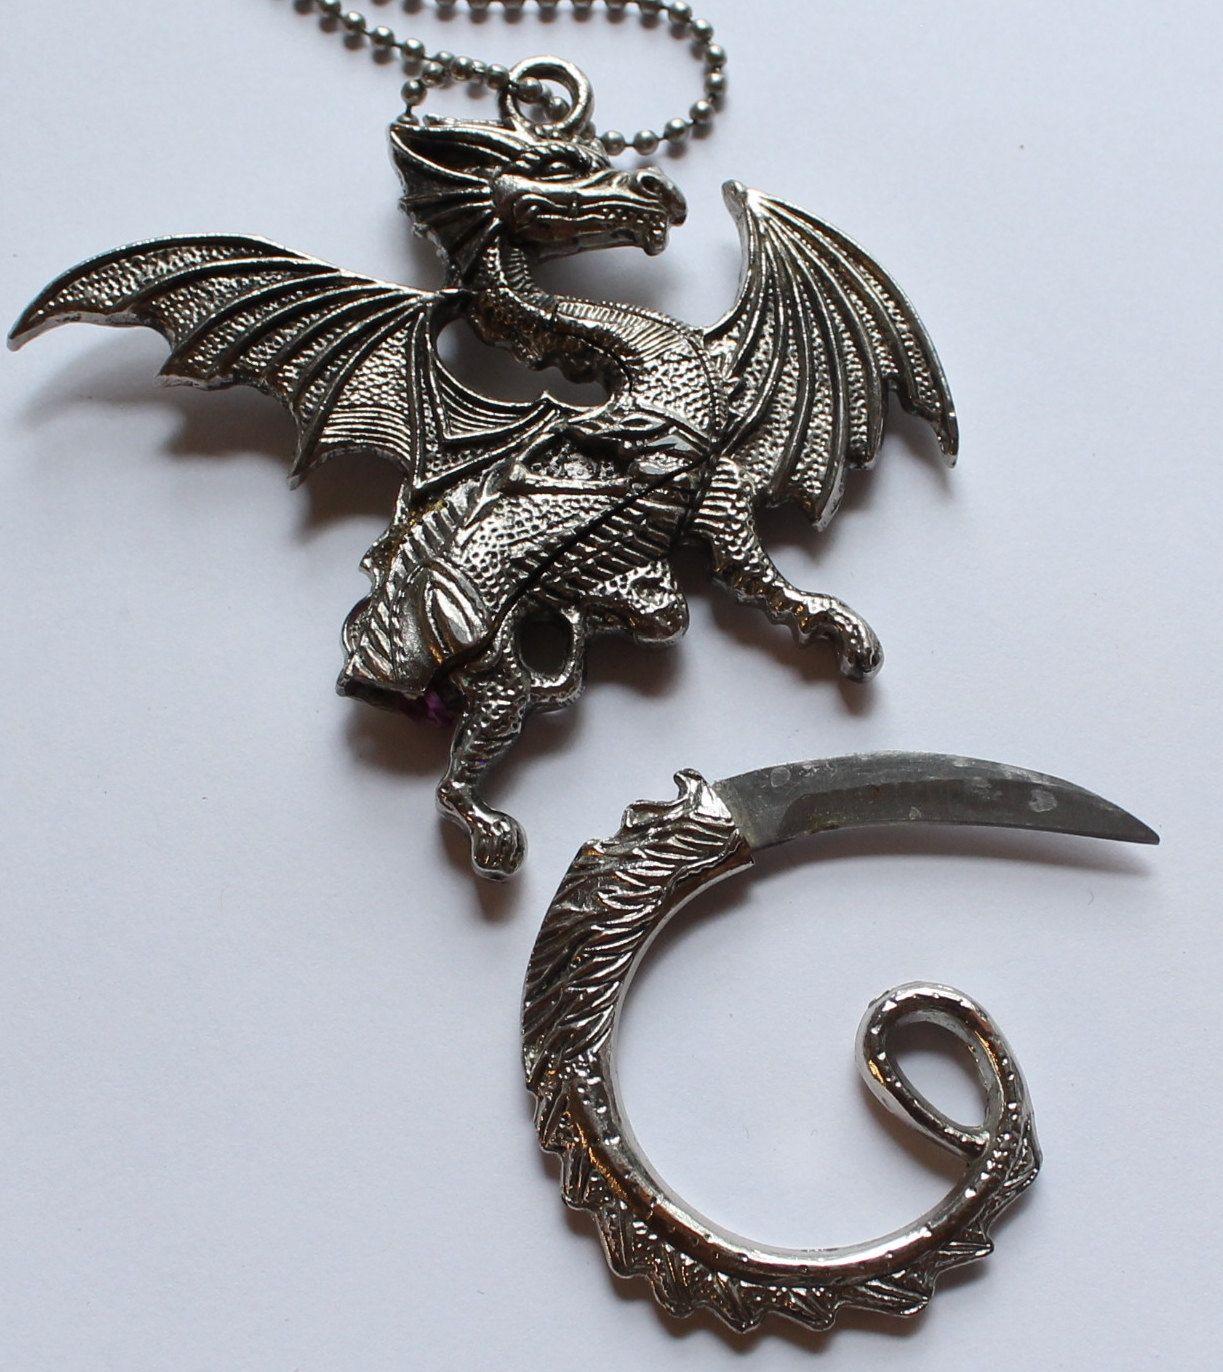 Silver Tone Dragon Hidden Knife Necklace | Knives, Dragons ... - photo#36